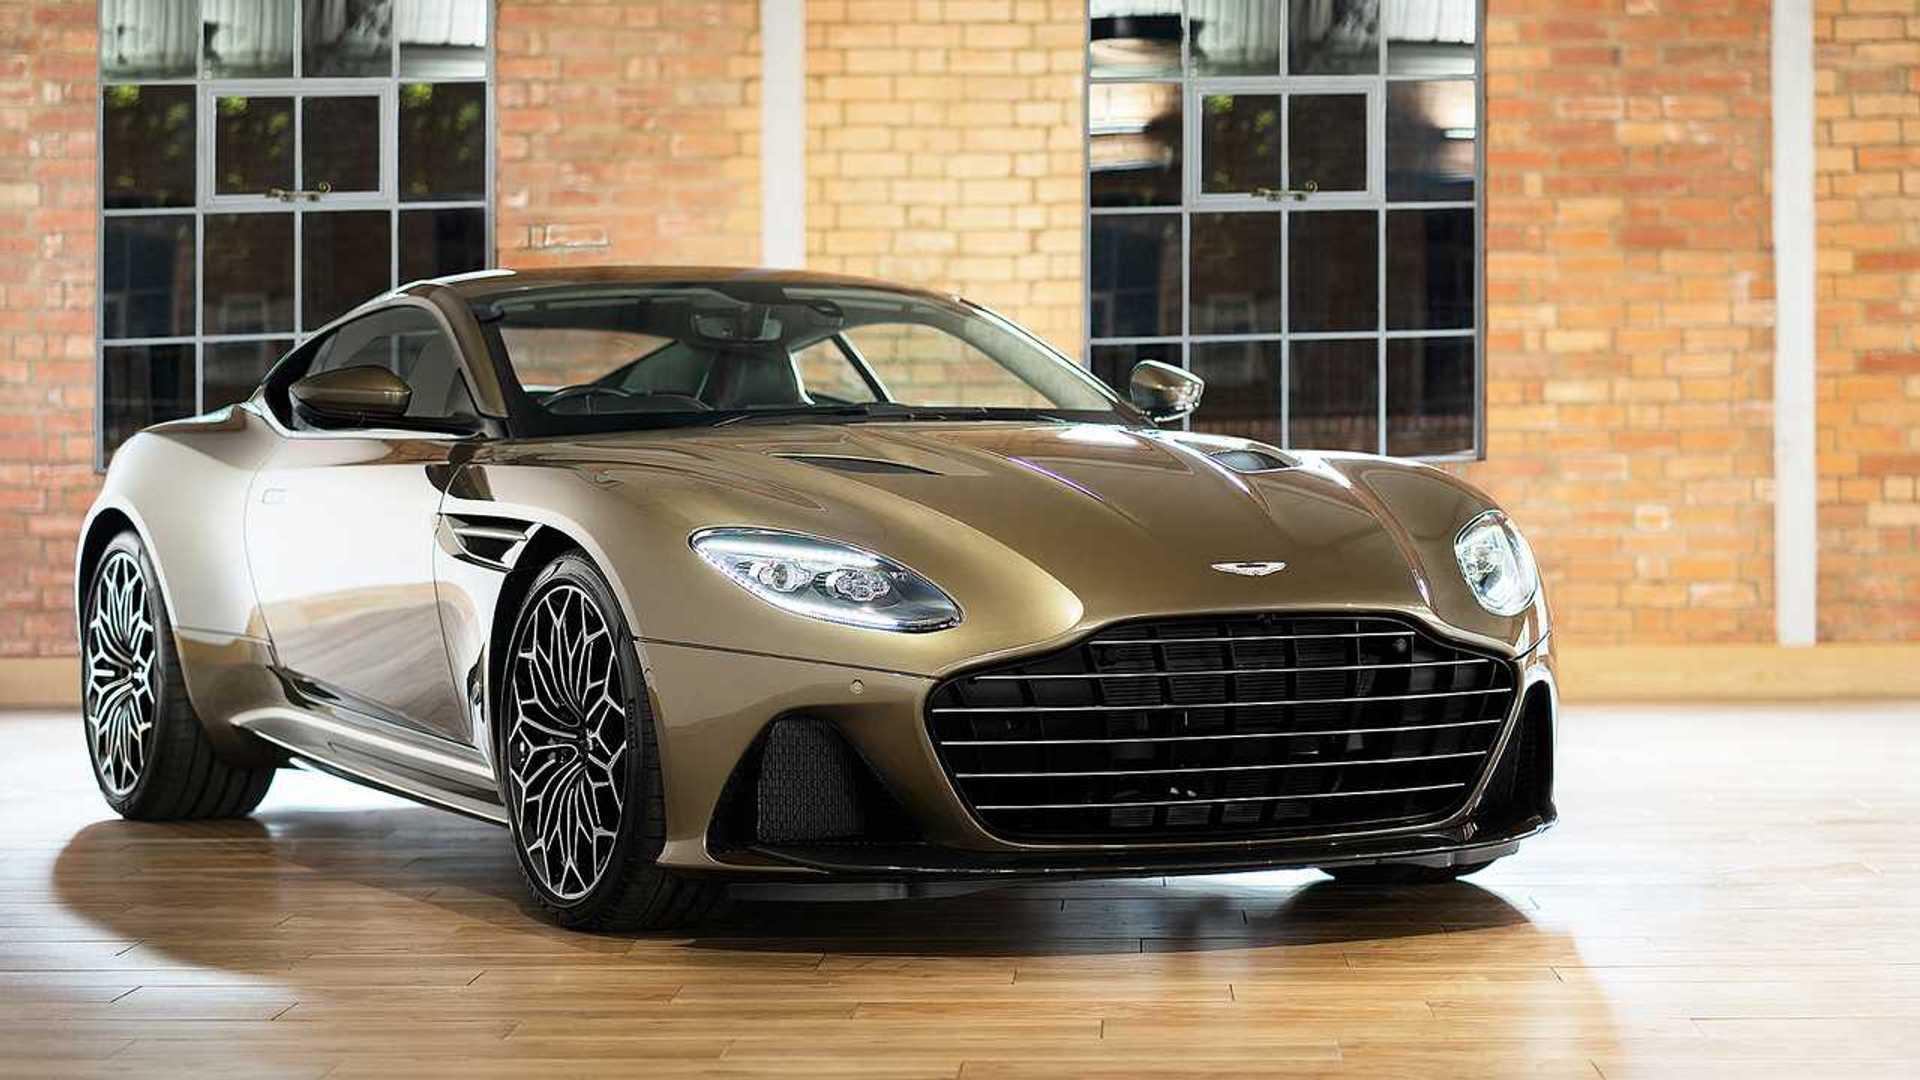 2019 Aston Martin Dbs Superleggera Gets James Bond Special